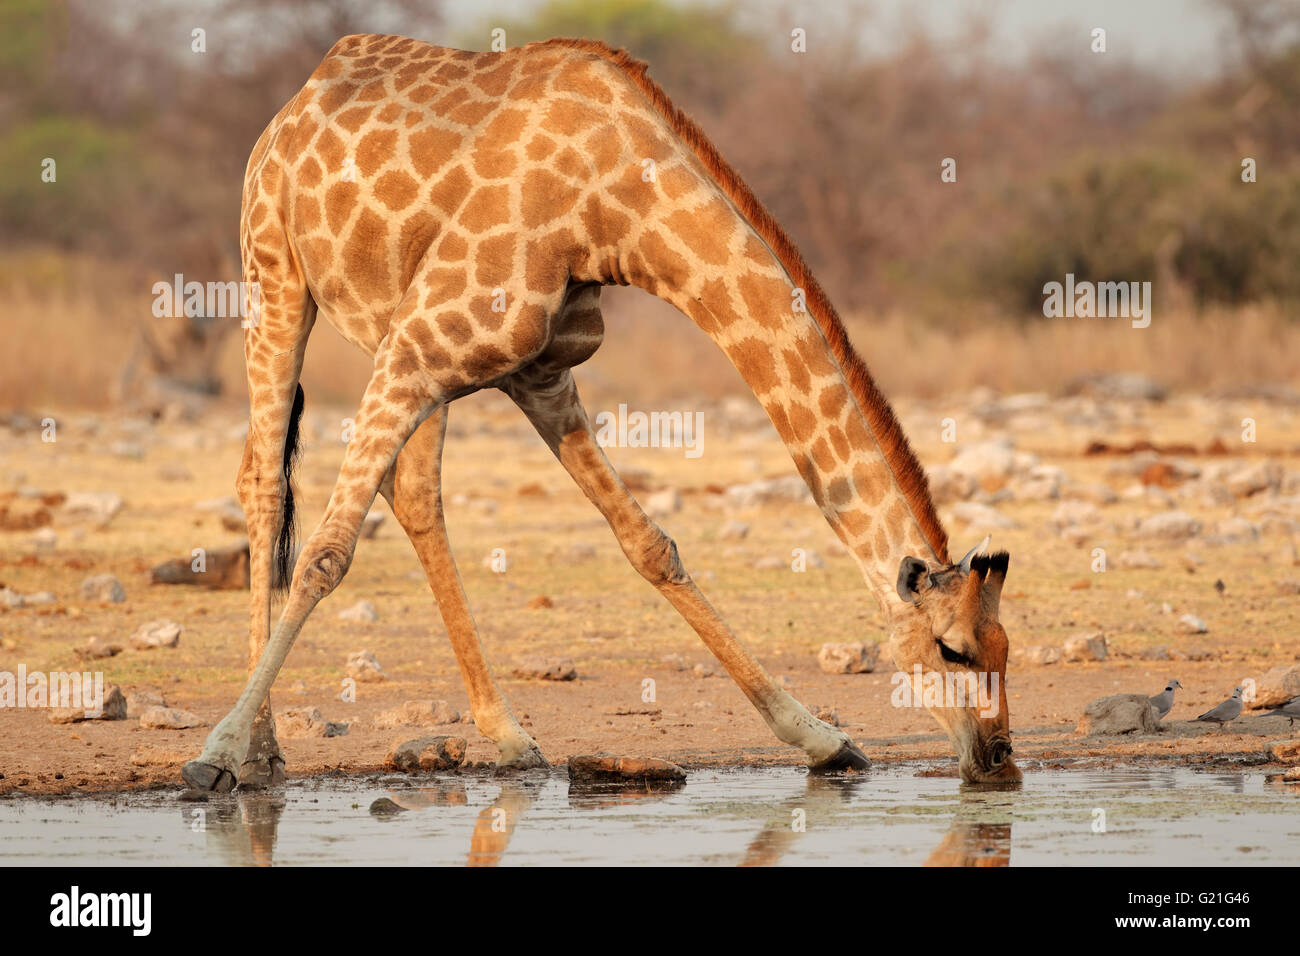 Giraffe (Giraffa camelopardalis) drinking water, Etosha National Park, Namibia - Stock Image